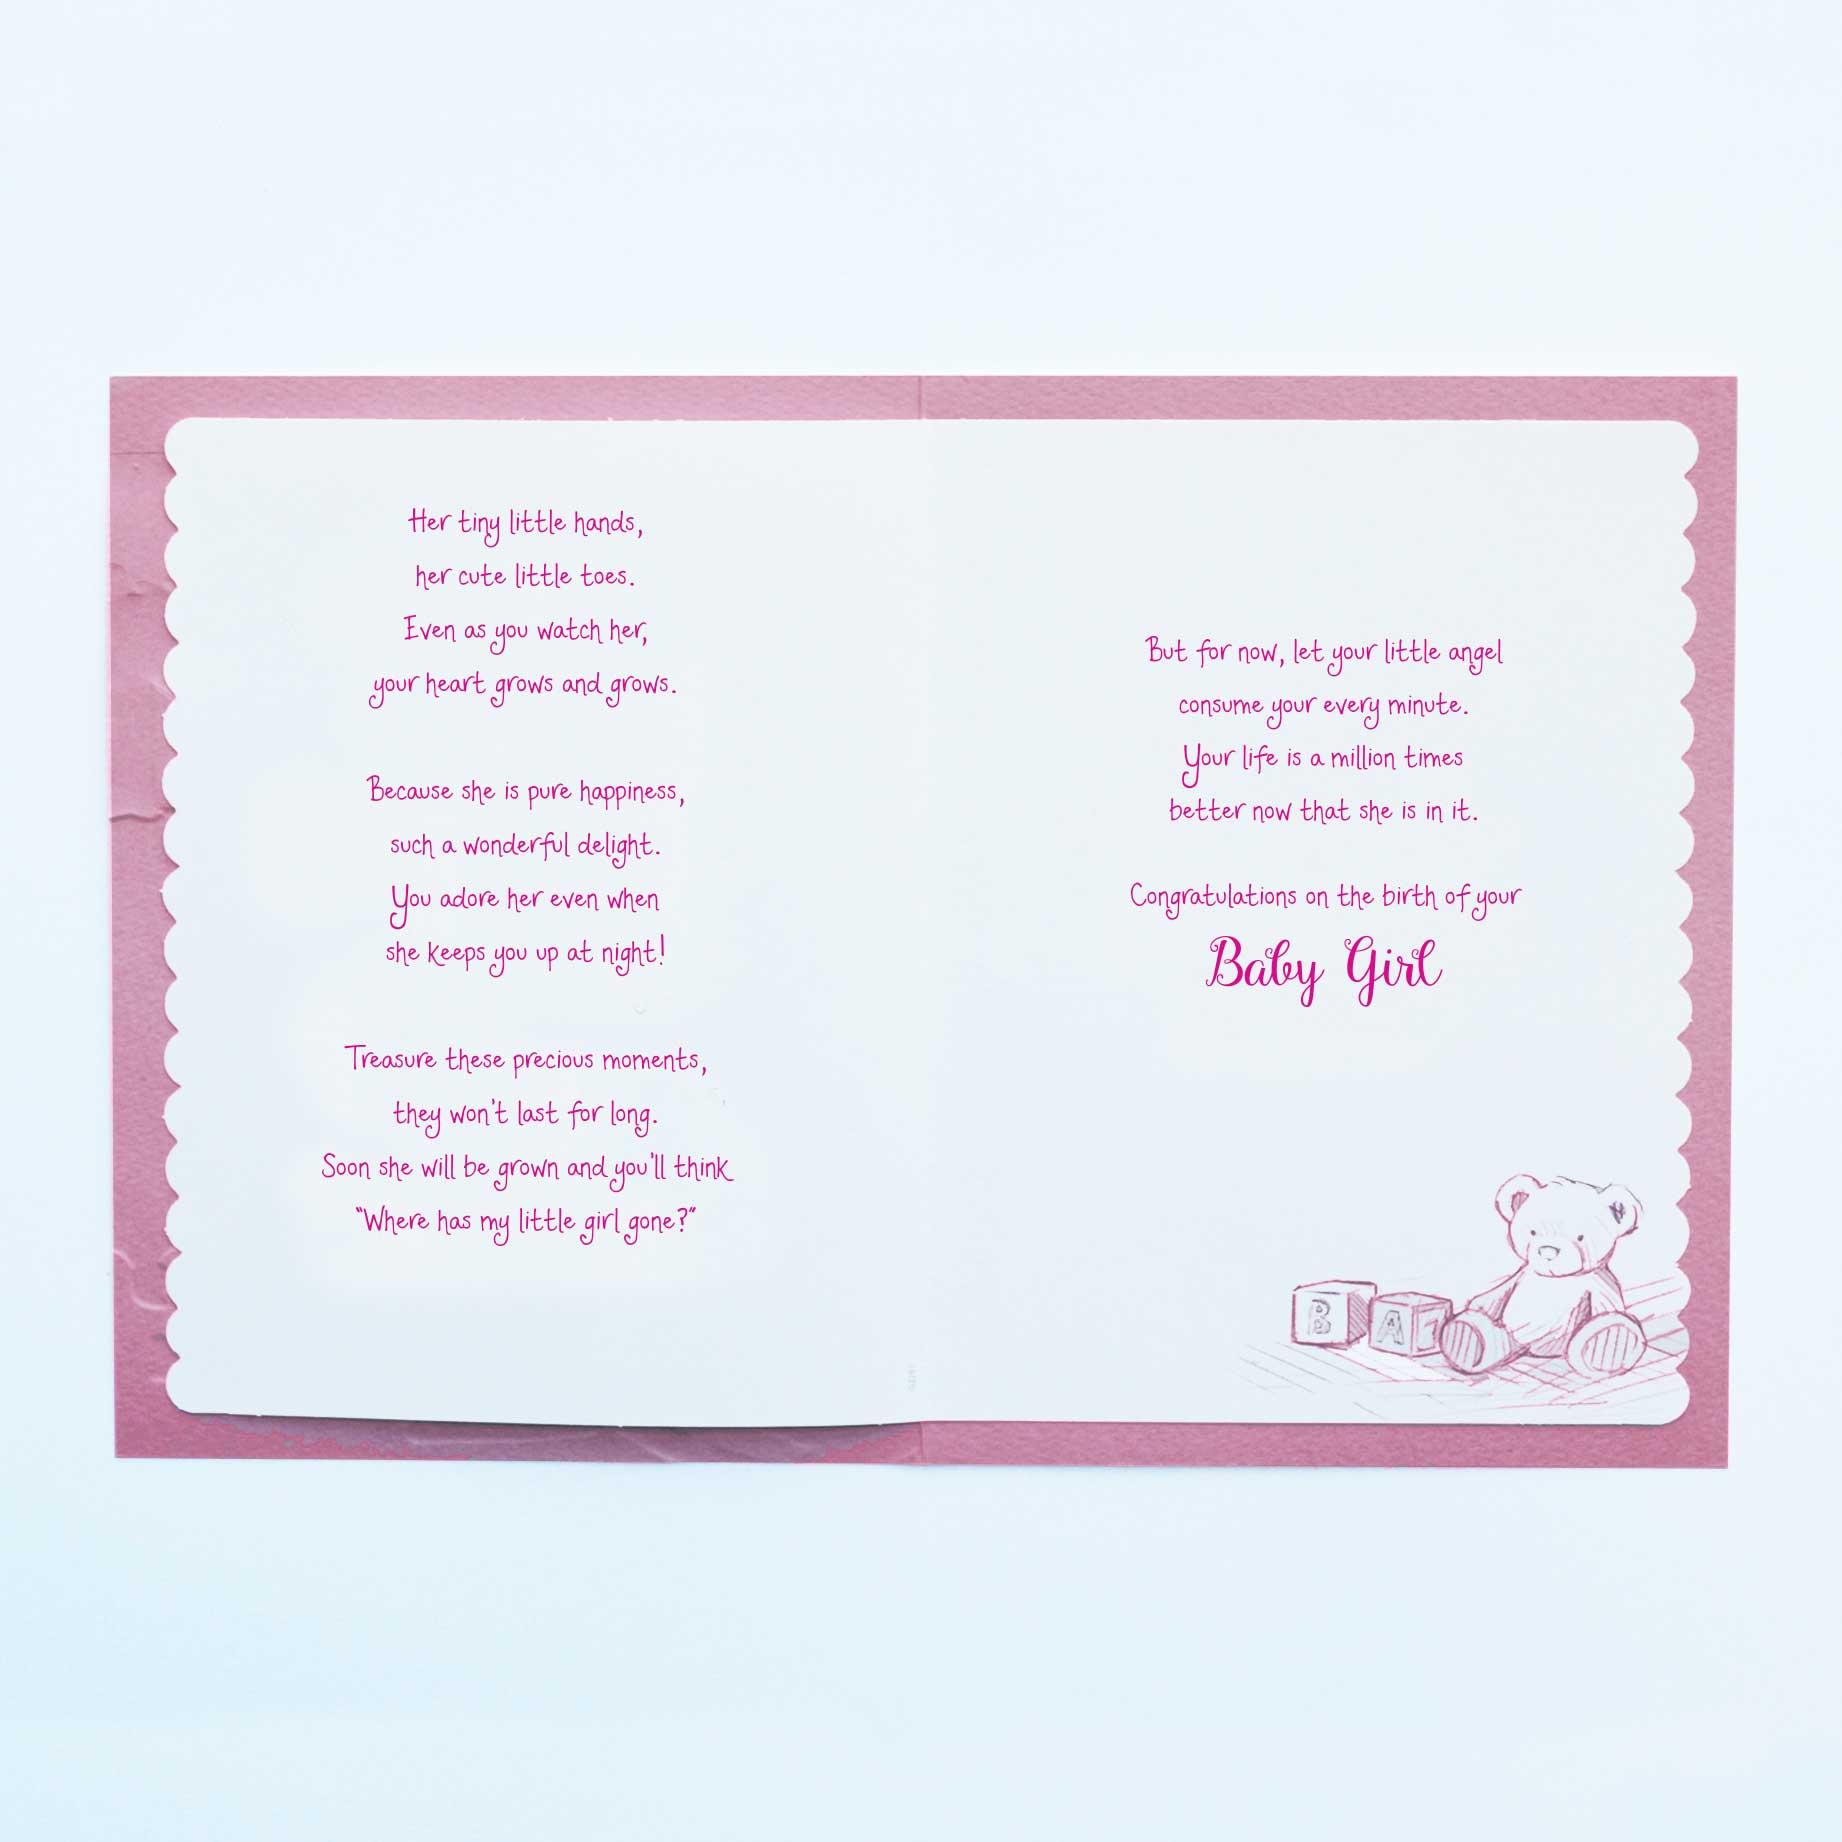 G2281 Baby Girl 2 Garlanna Greeting Cards